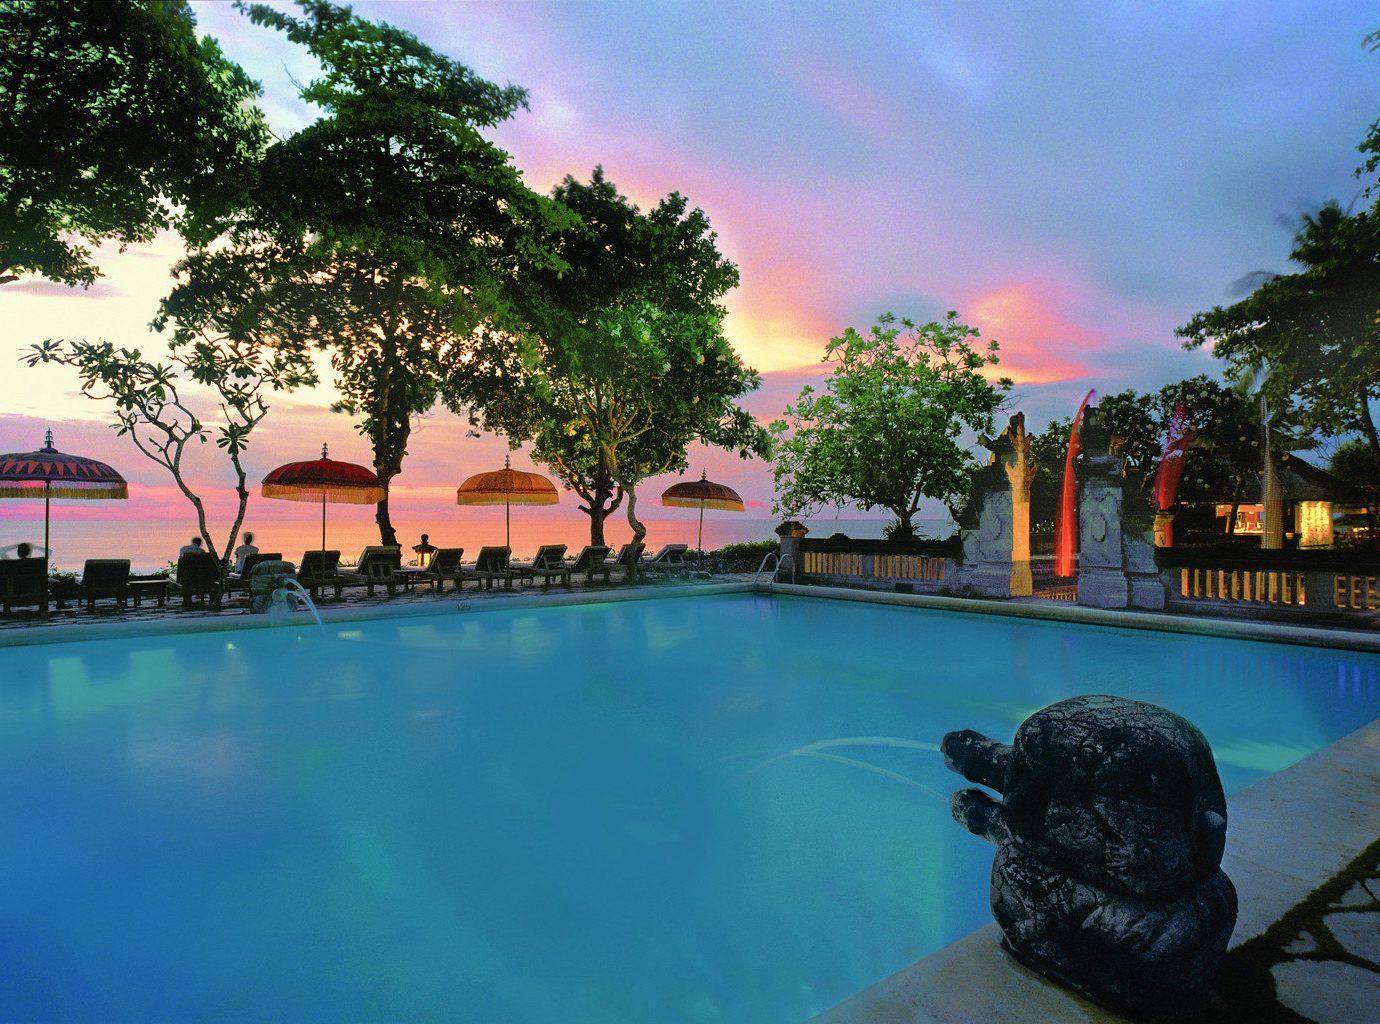 Beachfront Luxury Pool Sunset Trip Ideas tree outdoor swimming pool leisure Resort estate water sport vacation swimming mansion